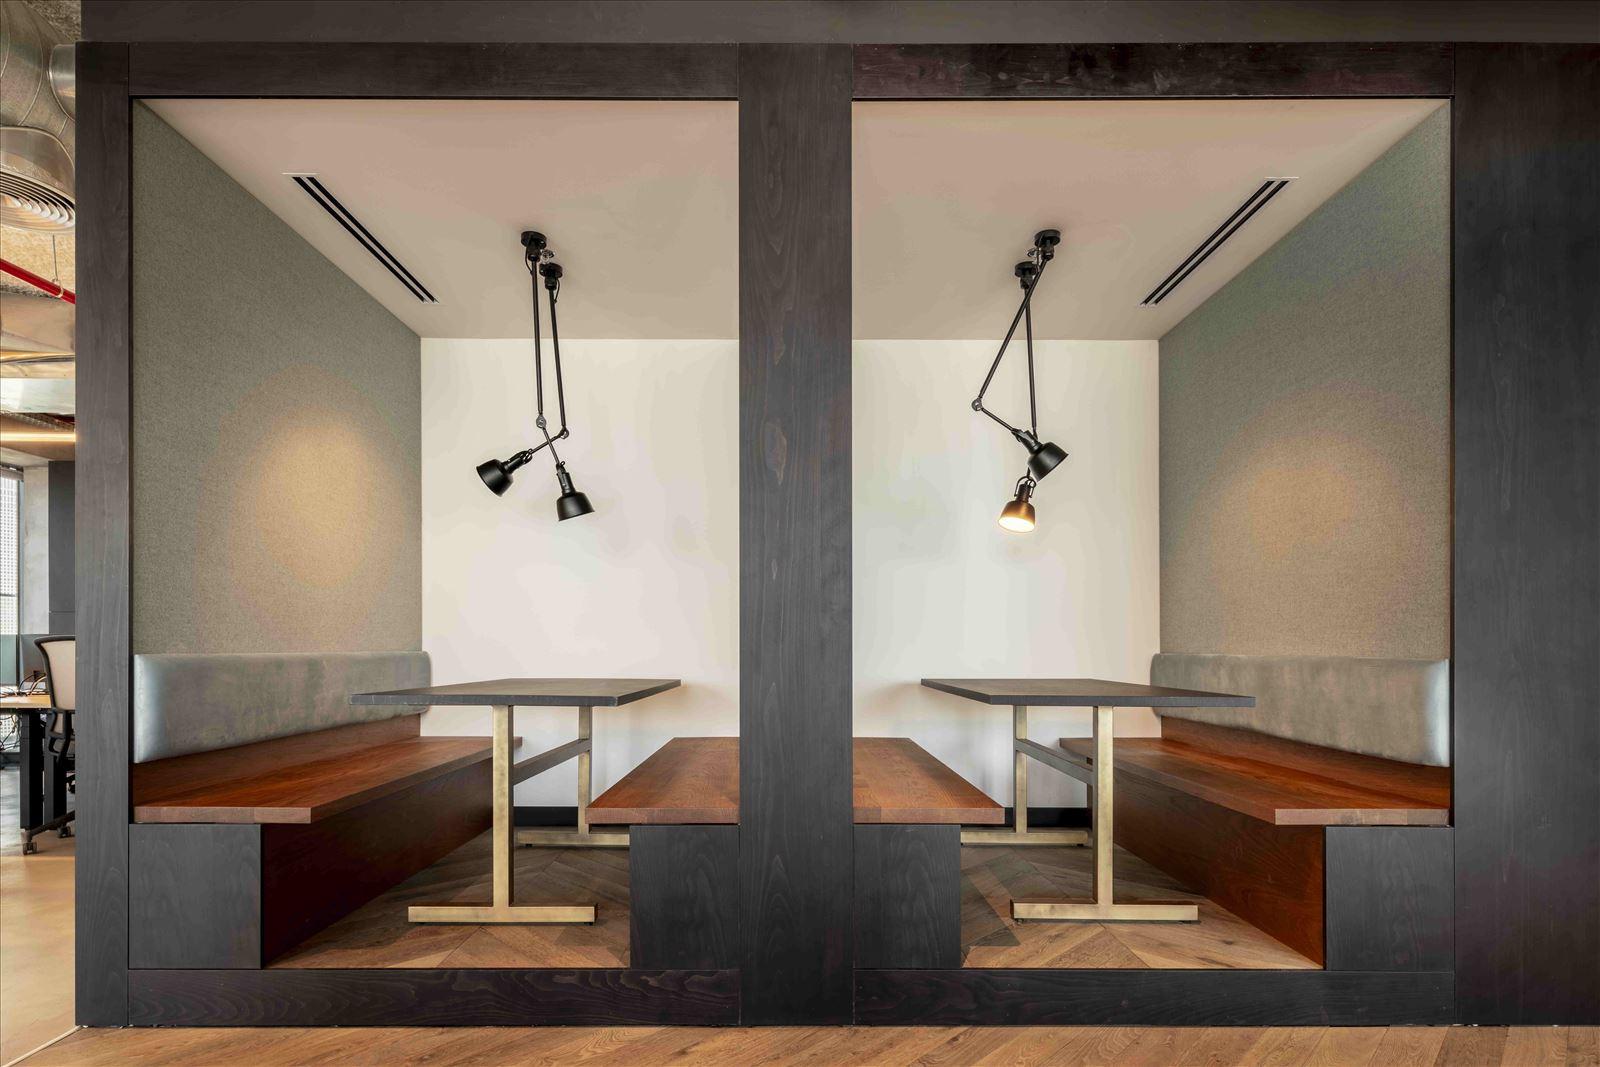 Office project תאורת תקרה במשרדים מבית דורי קמחי